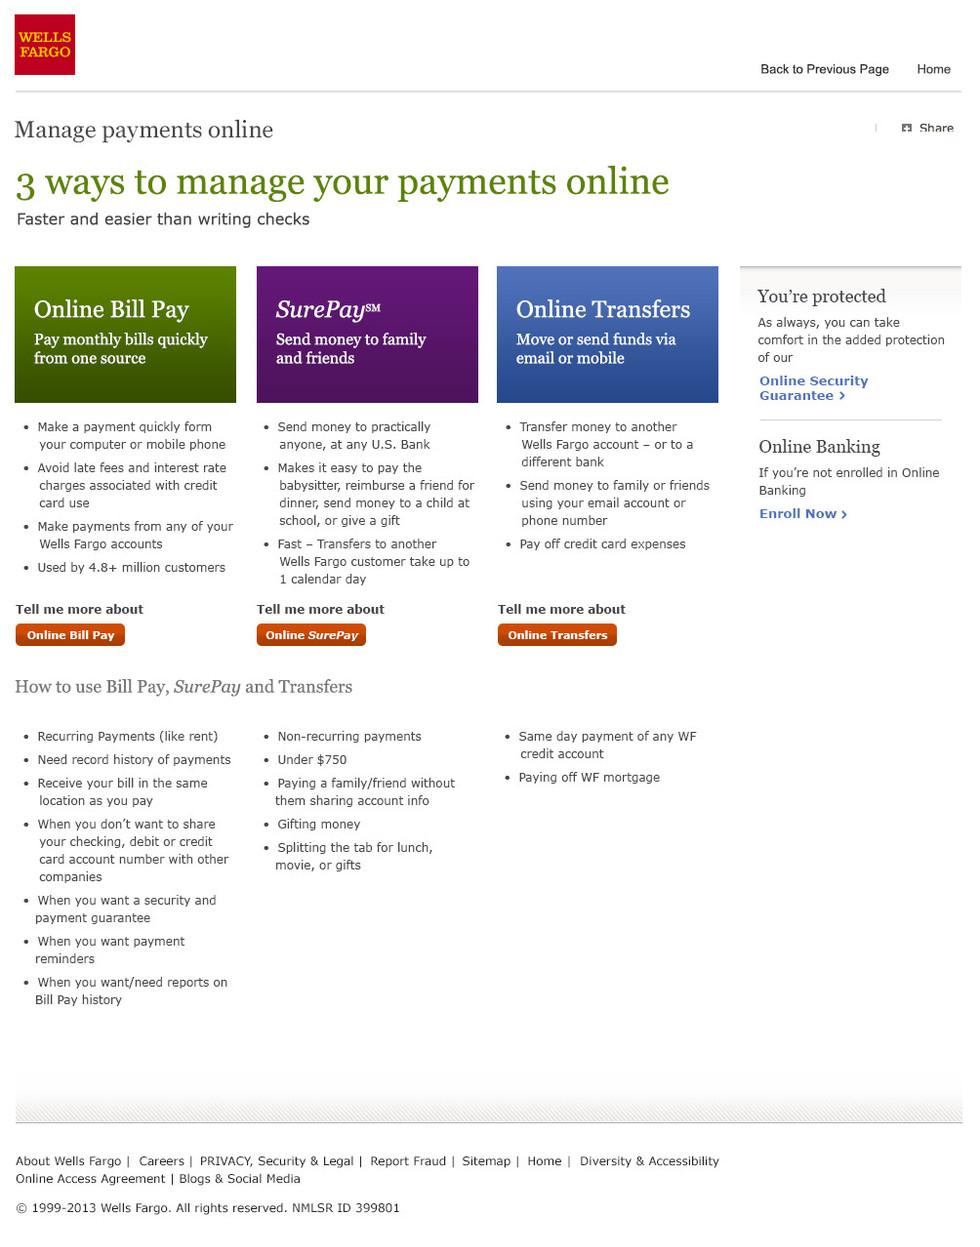 Bill Pay Landing Page